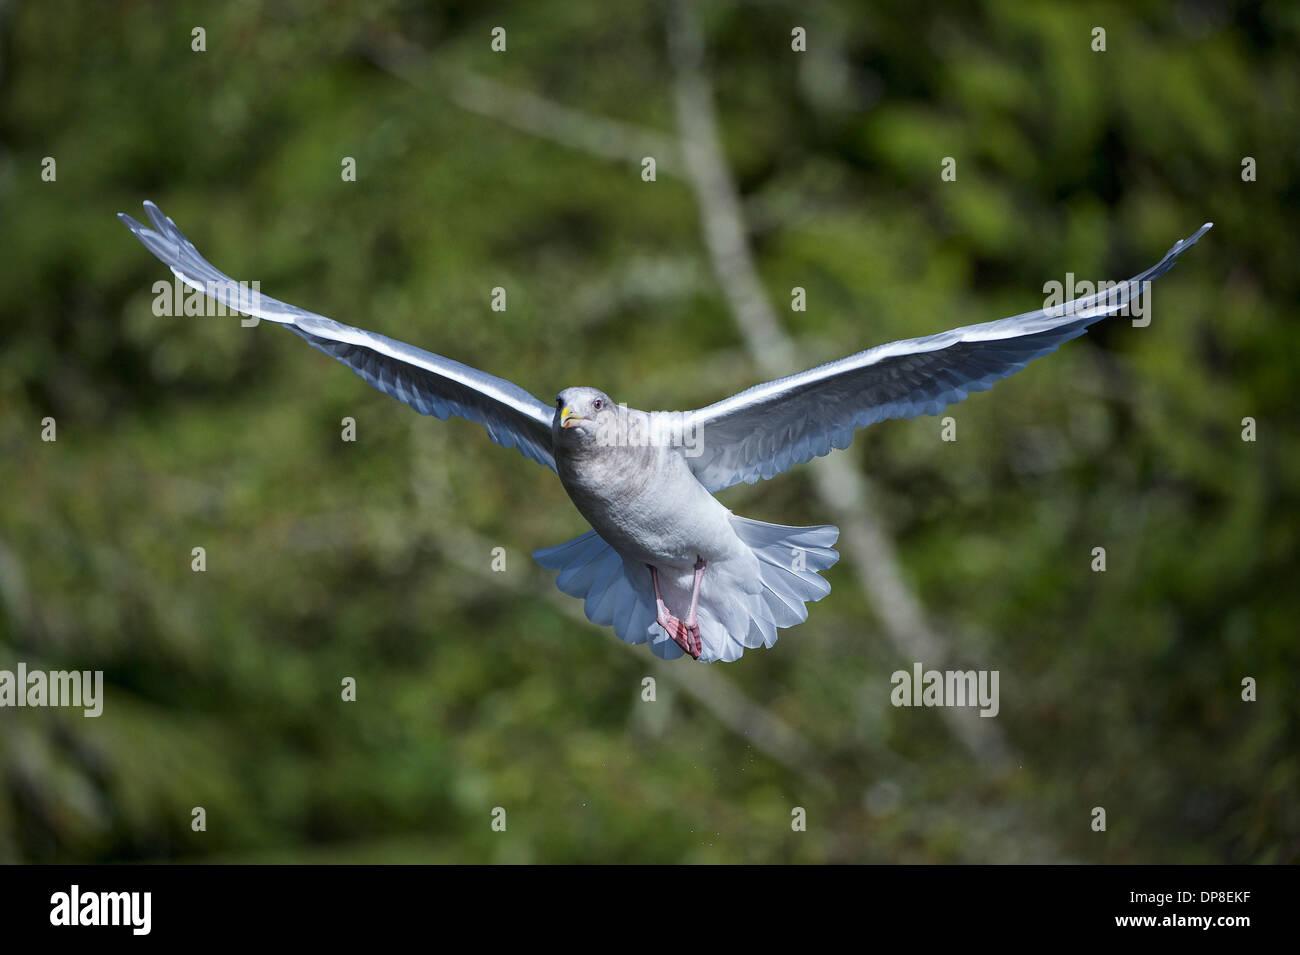 Glaucous-winged Gull (Larus glaucescens) in flight, Thronton Fish Hatchery, Ucluelet , British Columbia, Canada - Stock Image